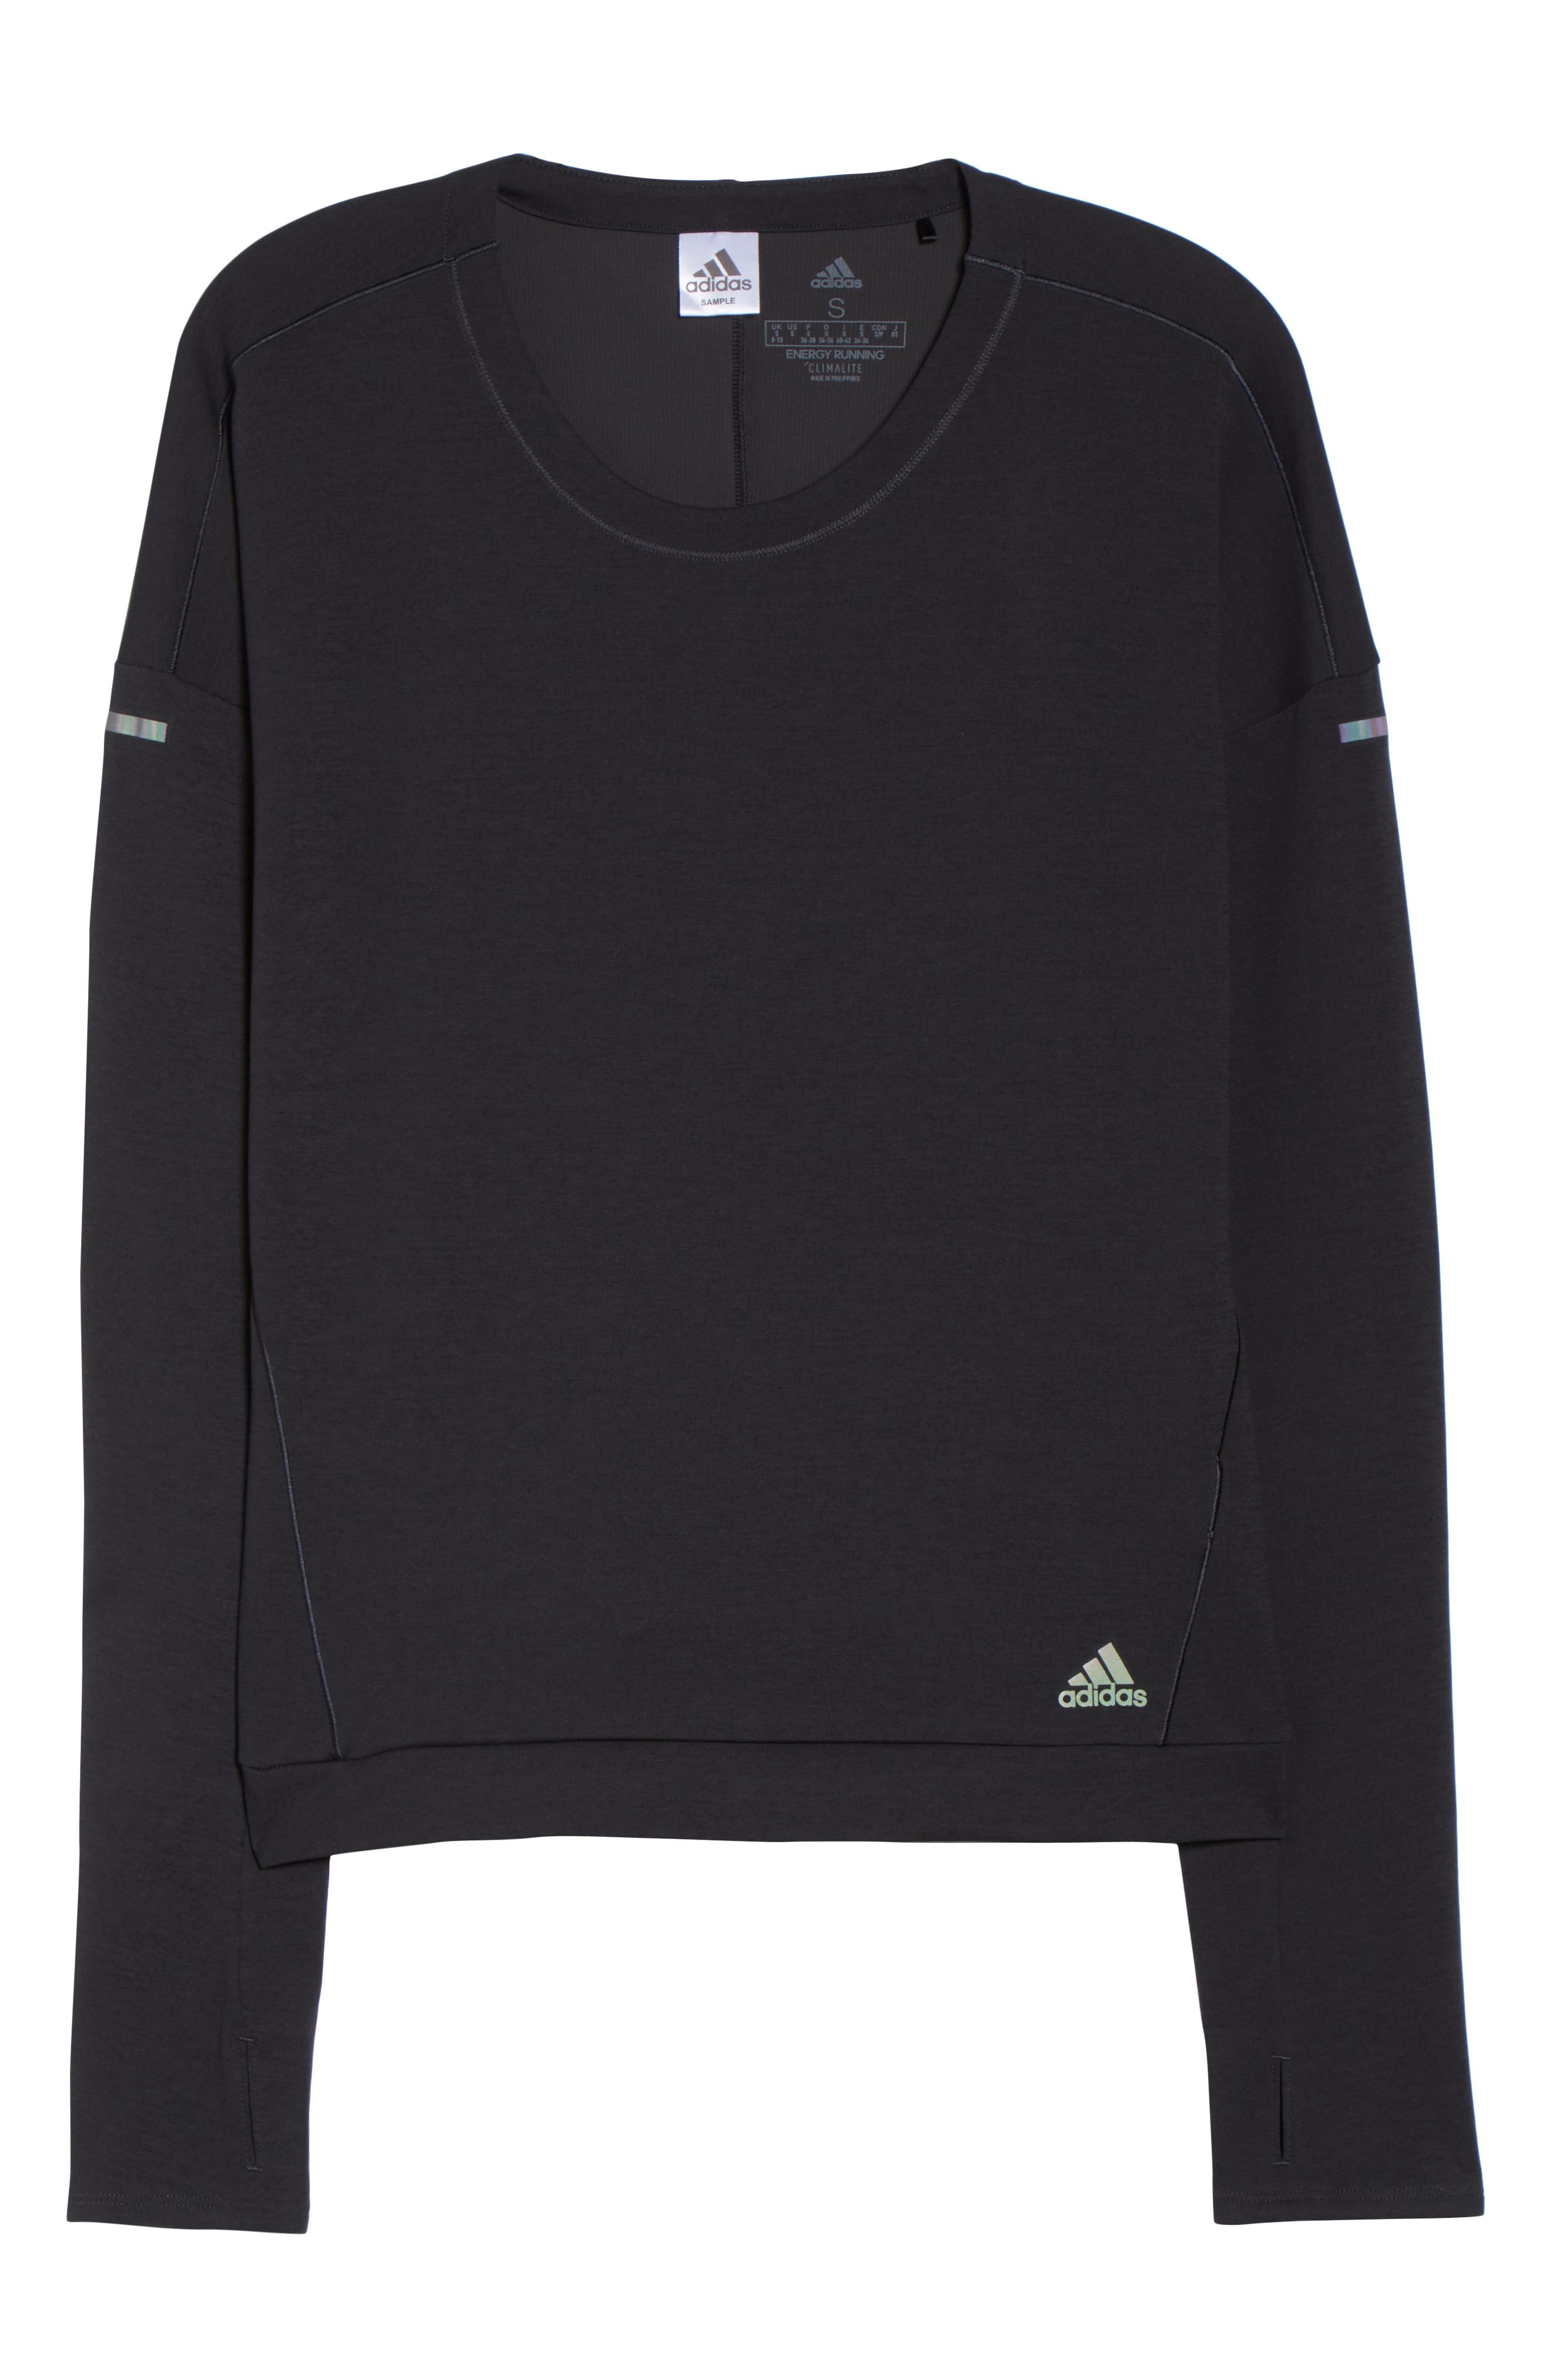 Supernova Run Sweatshirt,                             Alternate thumbnail 7, color,                             BLACK/ COLORED HEATHER